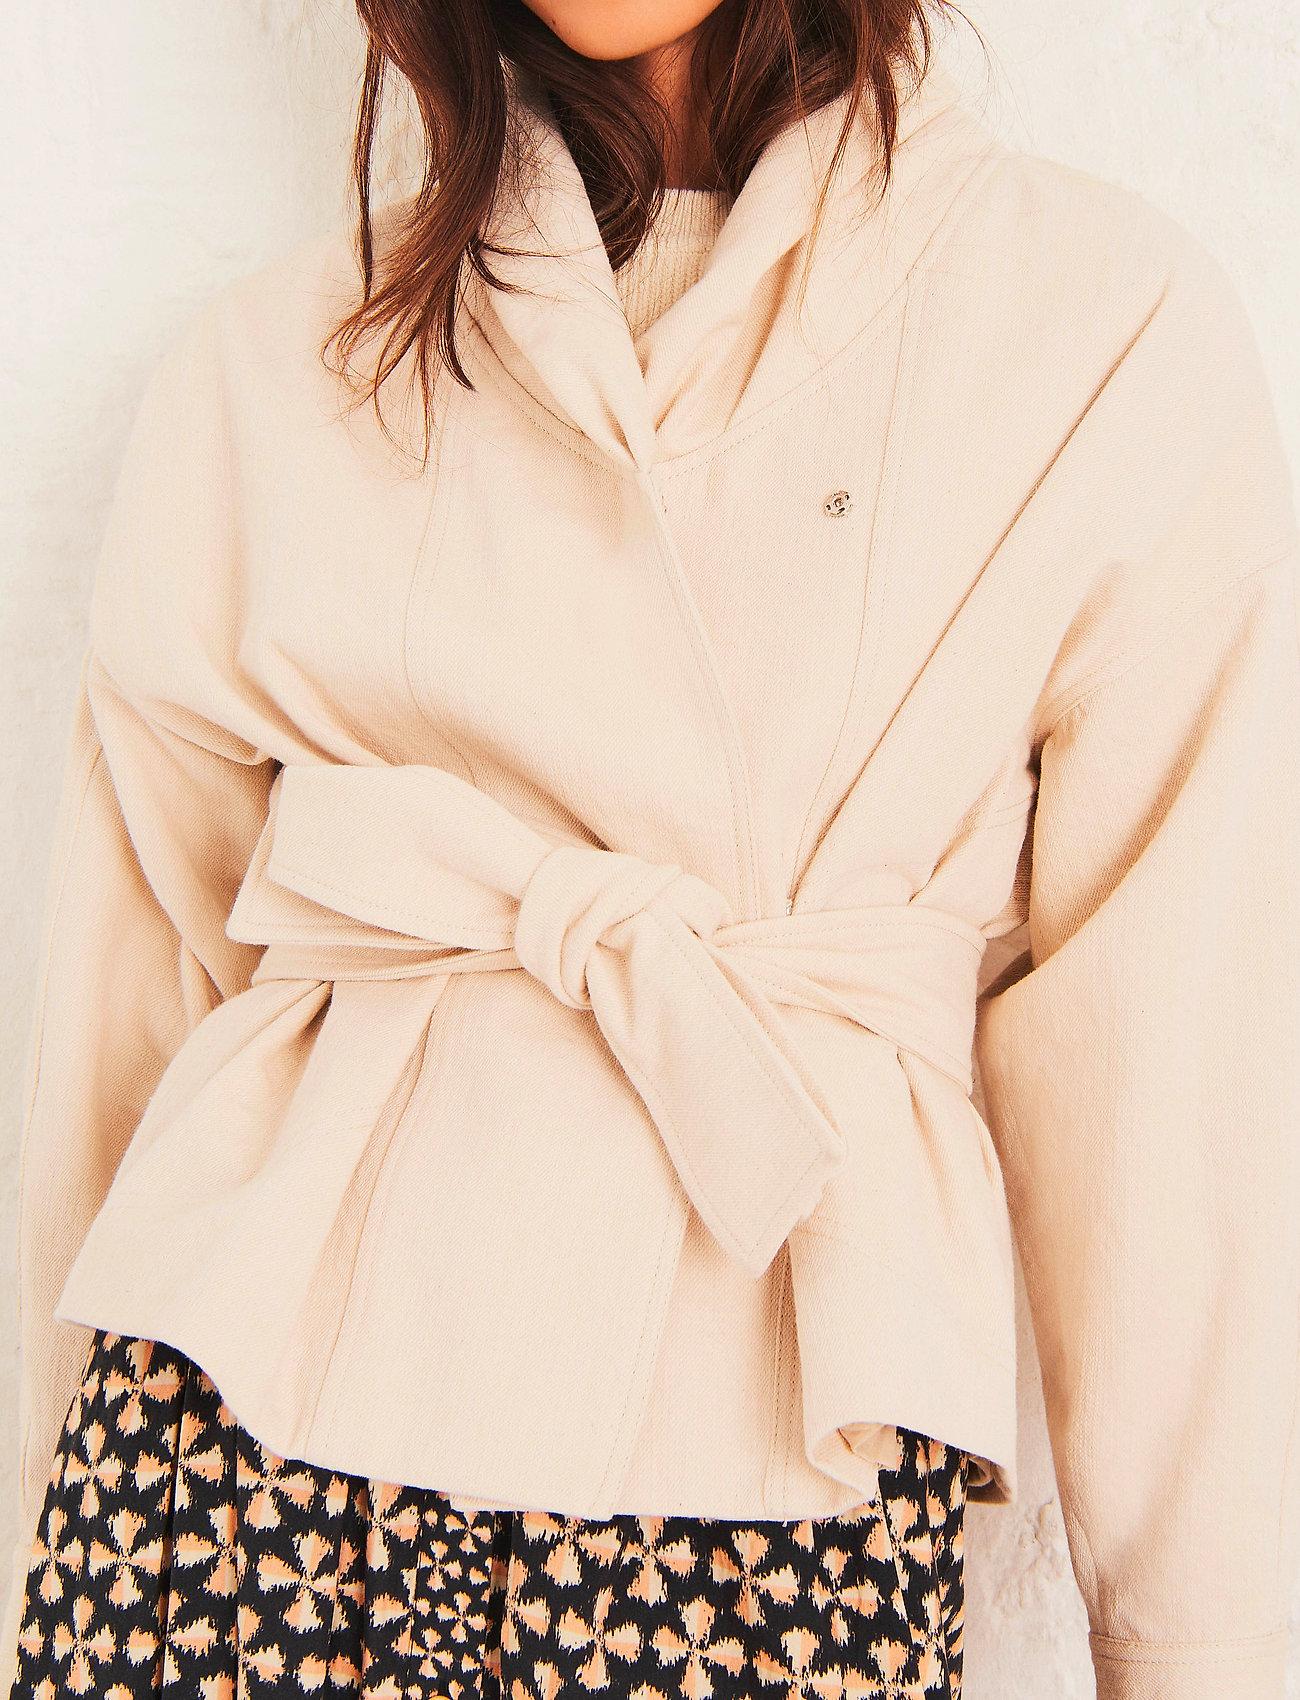 ba&sh - LOST JACKET - wool jackets - off white - 0